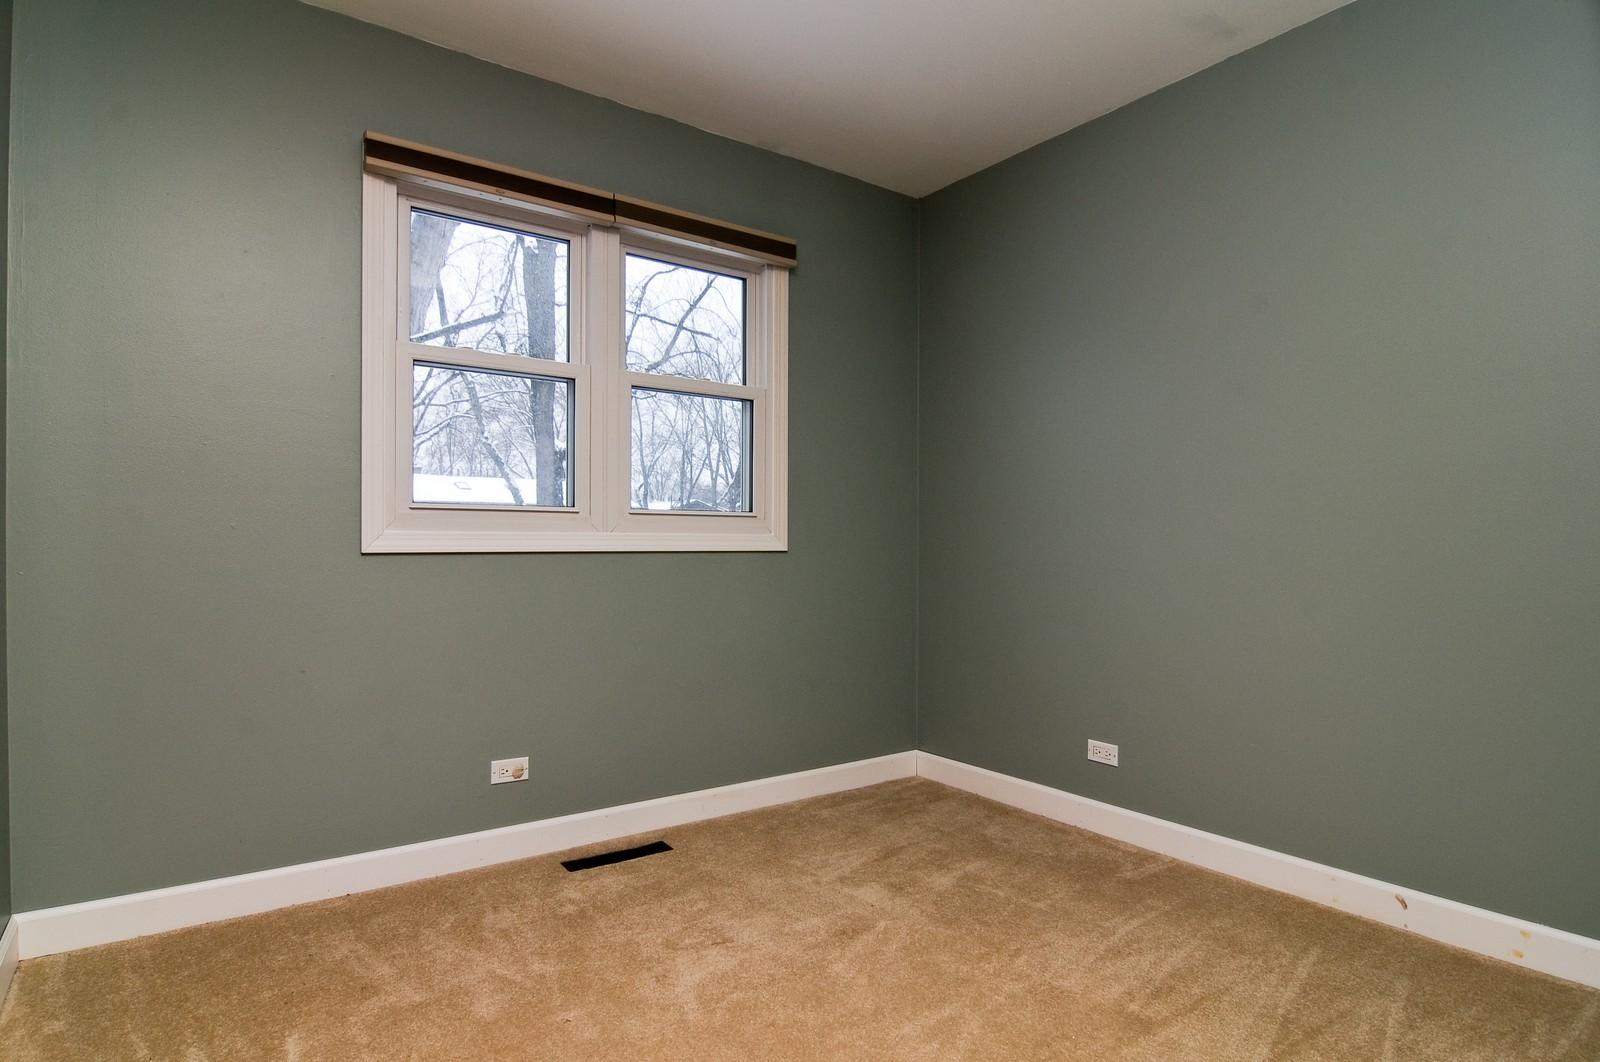 Real Estate Photography - 18648 W Pamela Pl, Gurnee, IL, 60031 - Location 2